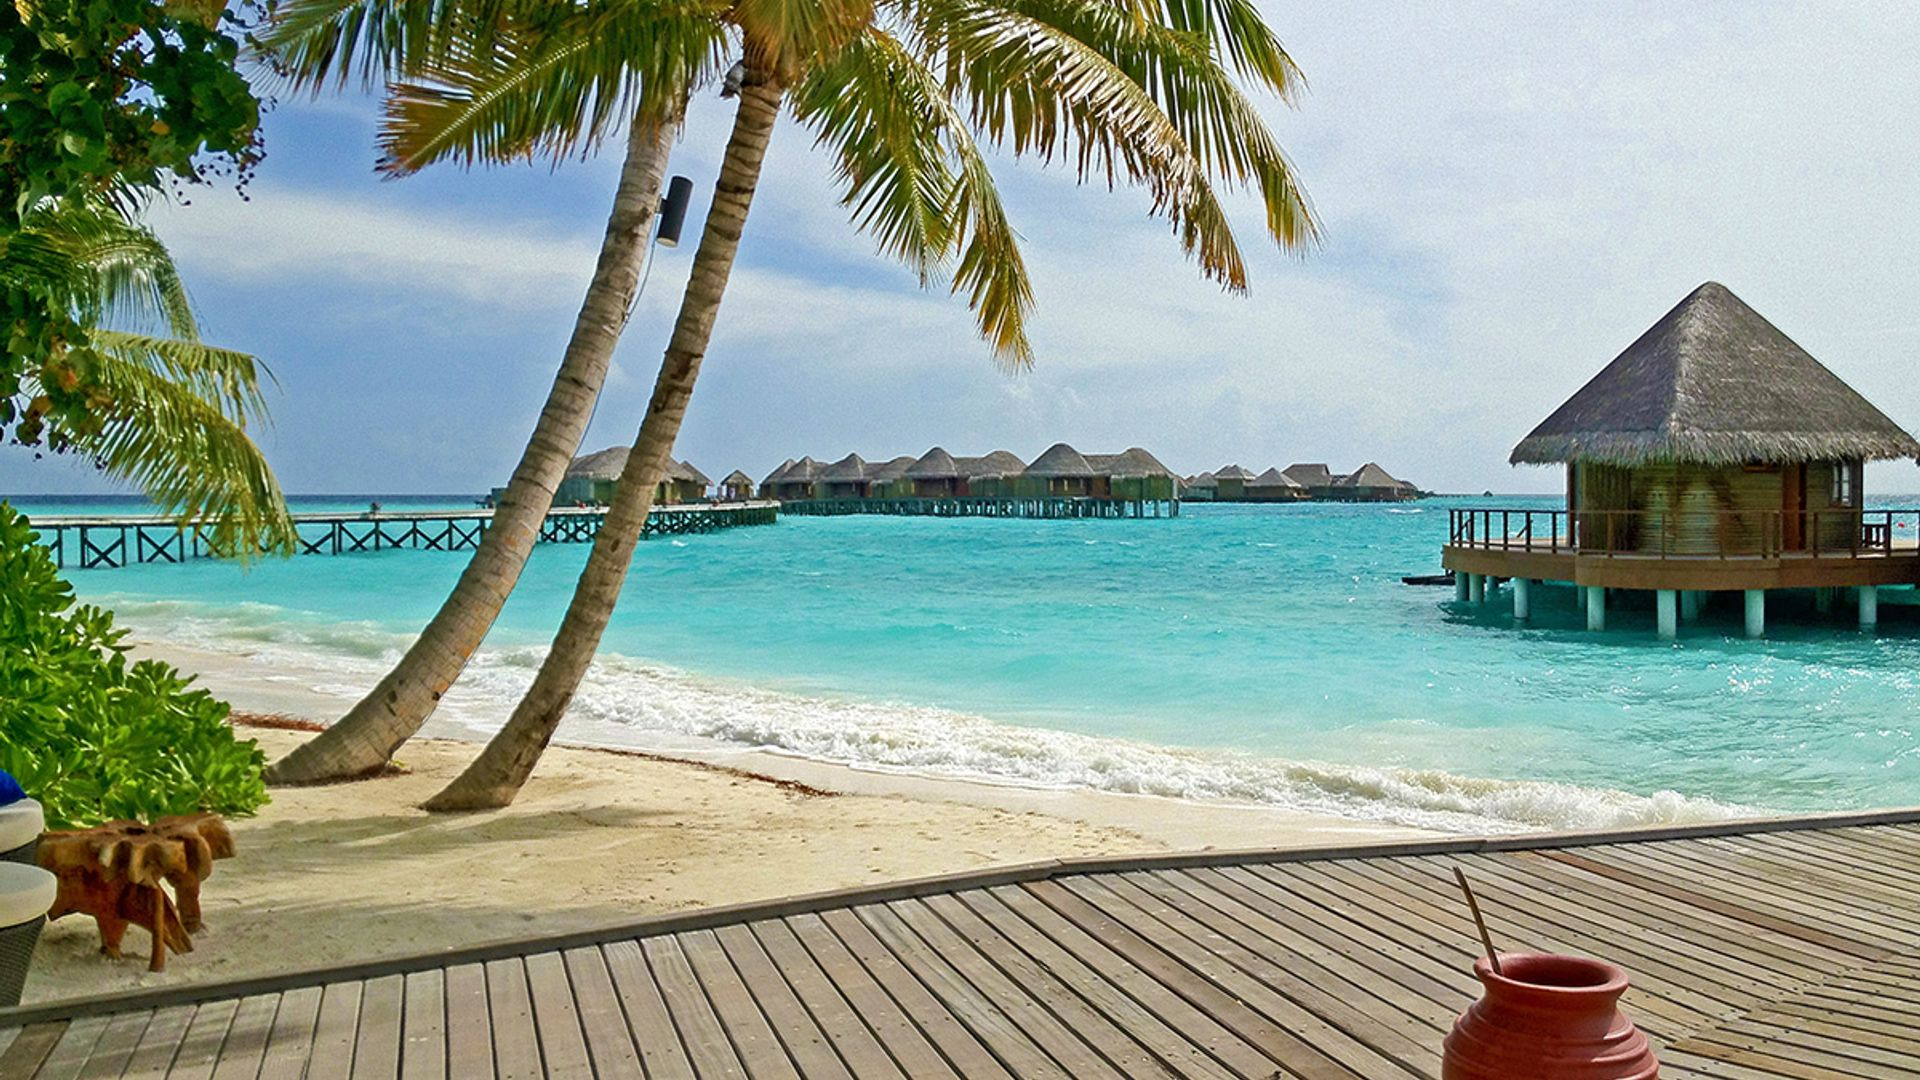 Sejur charter Maldive, 10 zile - martie 2022